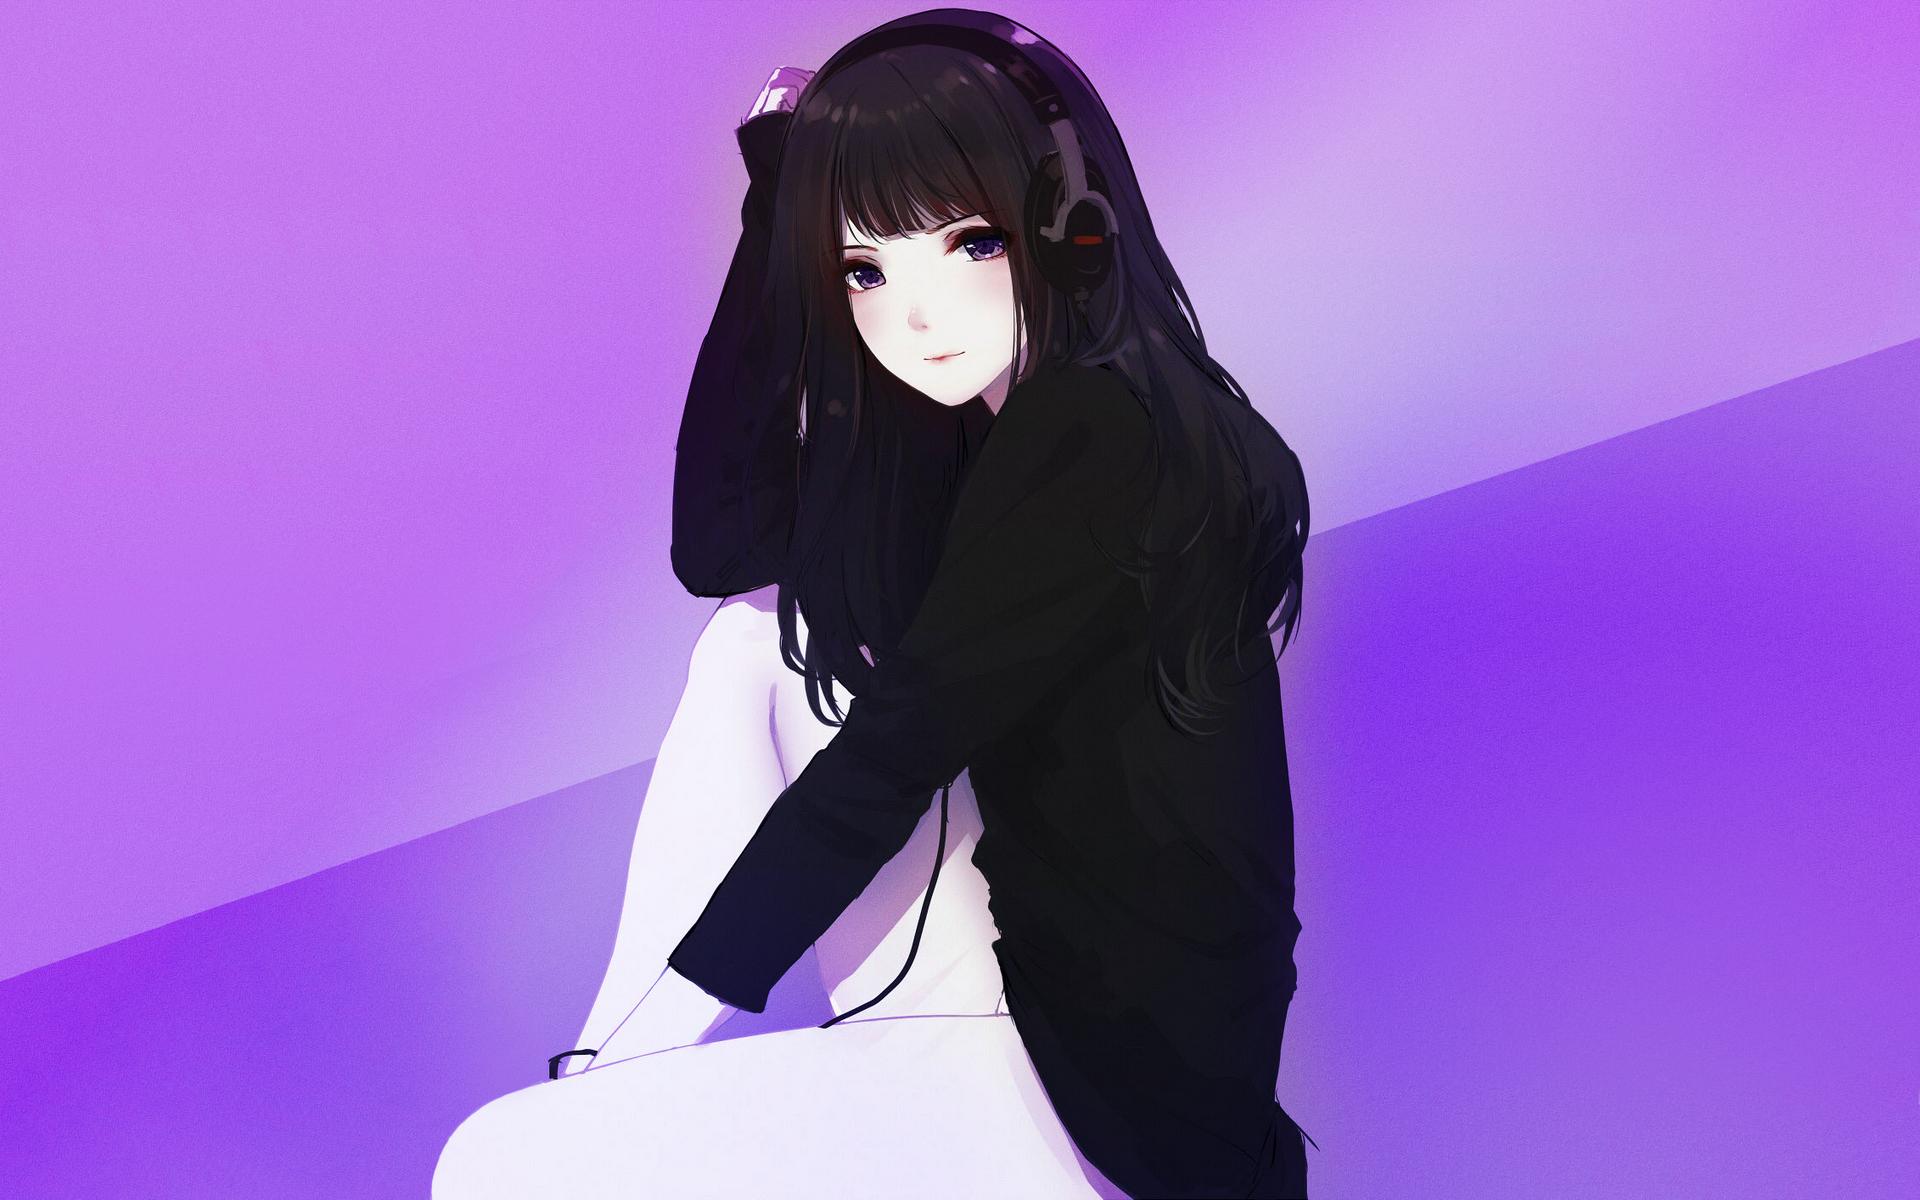 Anime 1920x1200 simple background headphones original characters